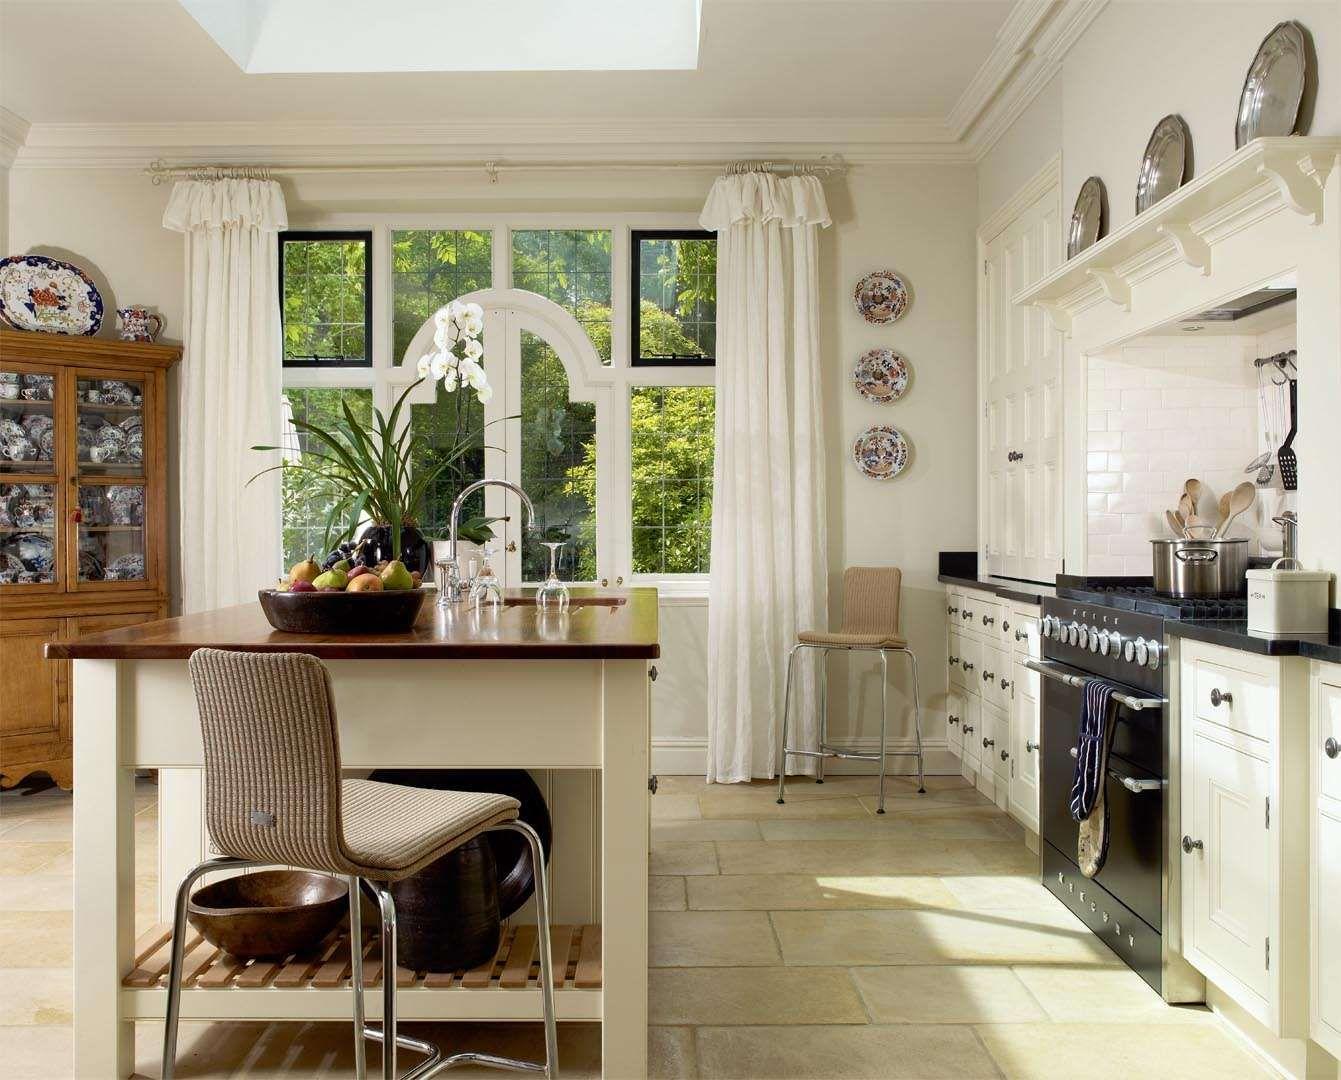 edwardian style kitchen - Google Search   Victorian homes   Pinterest